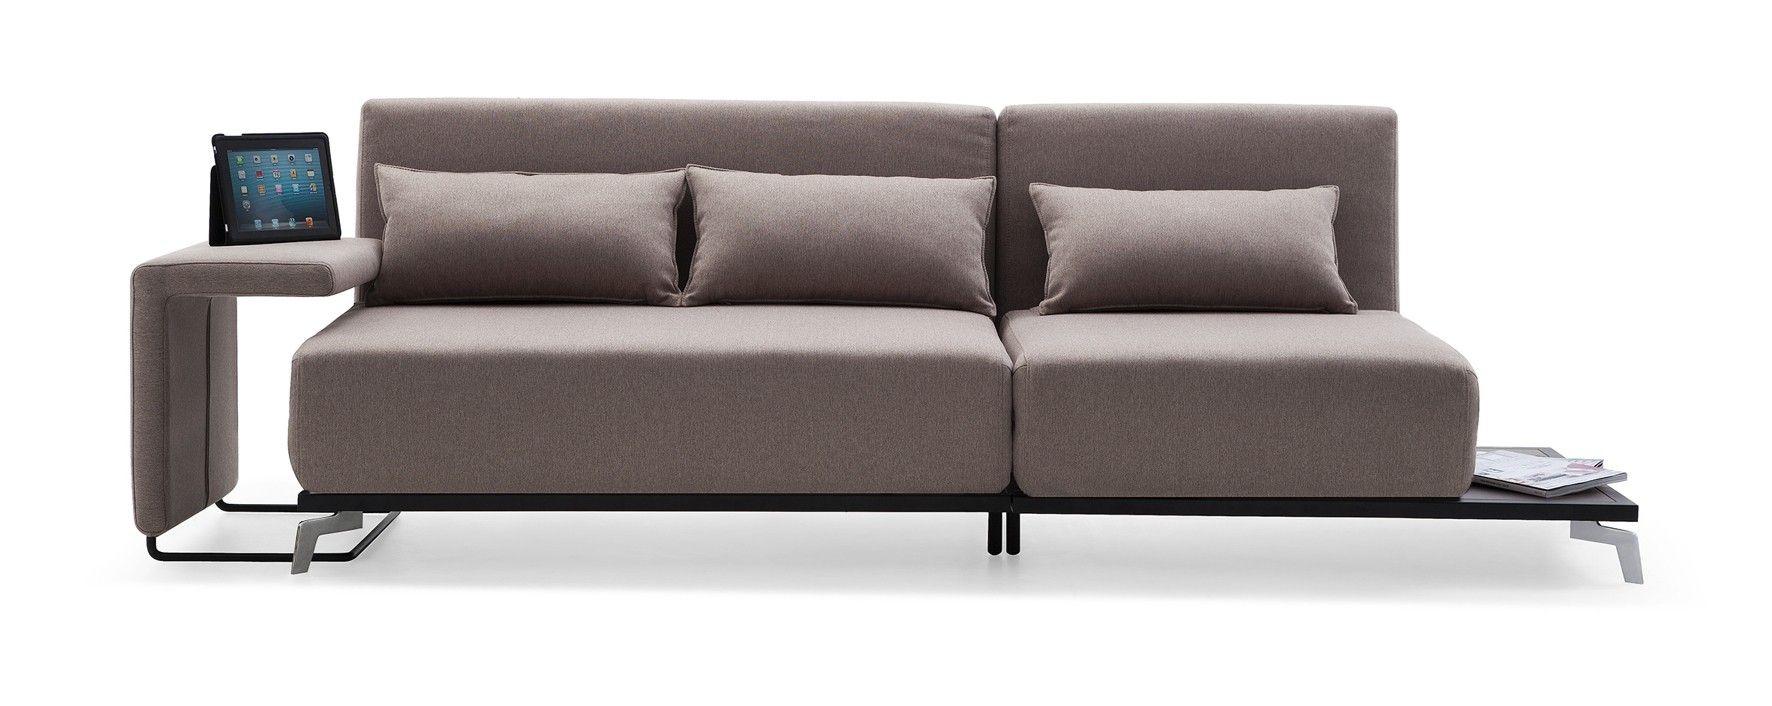 Charmant CADO Modern Furniture   JH033 Modern Sofa Bed